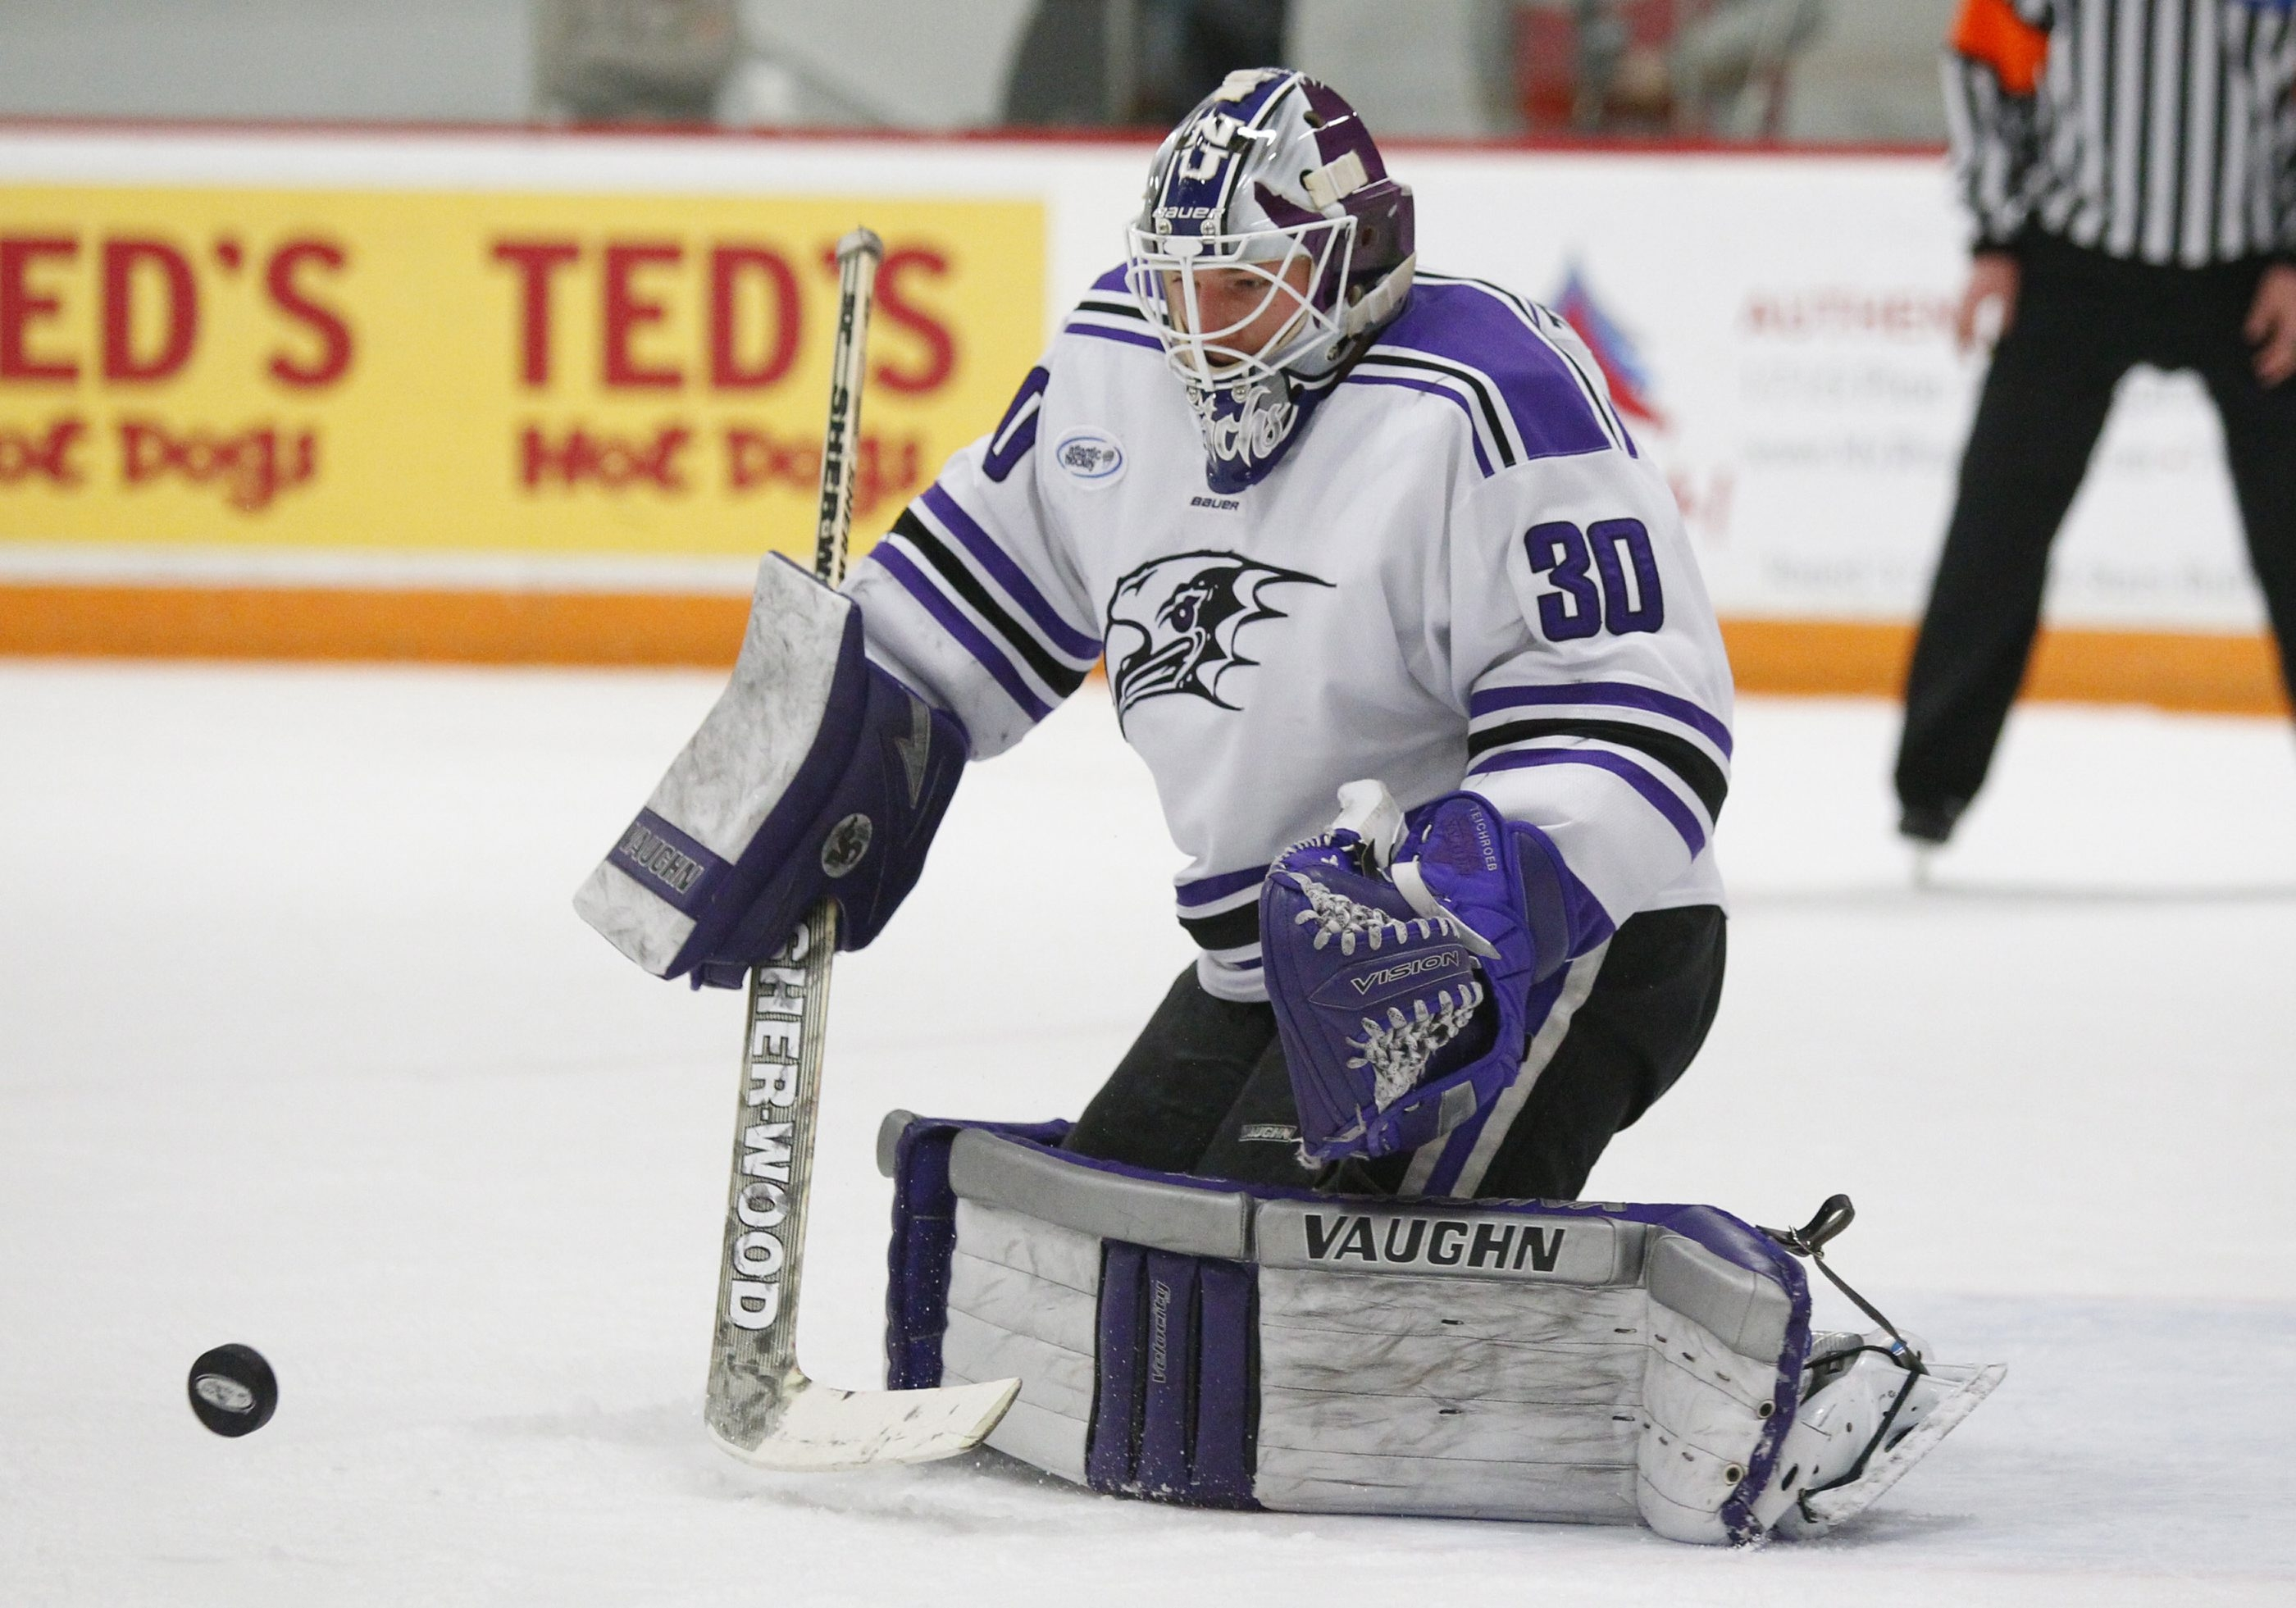 Niagara goaltender Jackson Teichroeb makes a save against a  Canisius player in a game on Feb. 6.